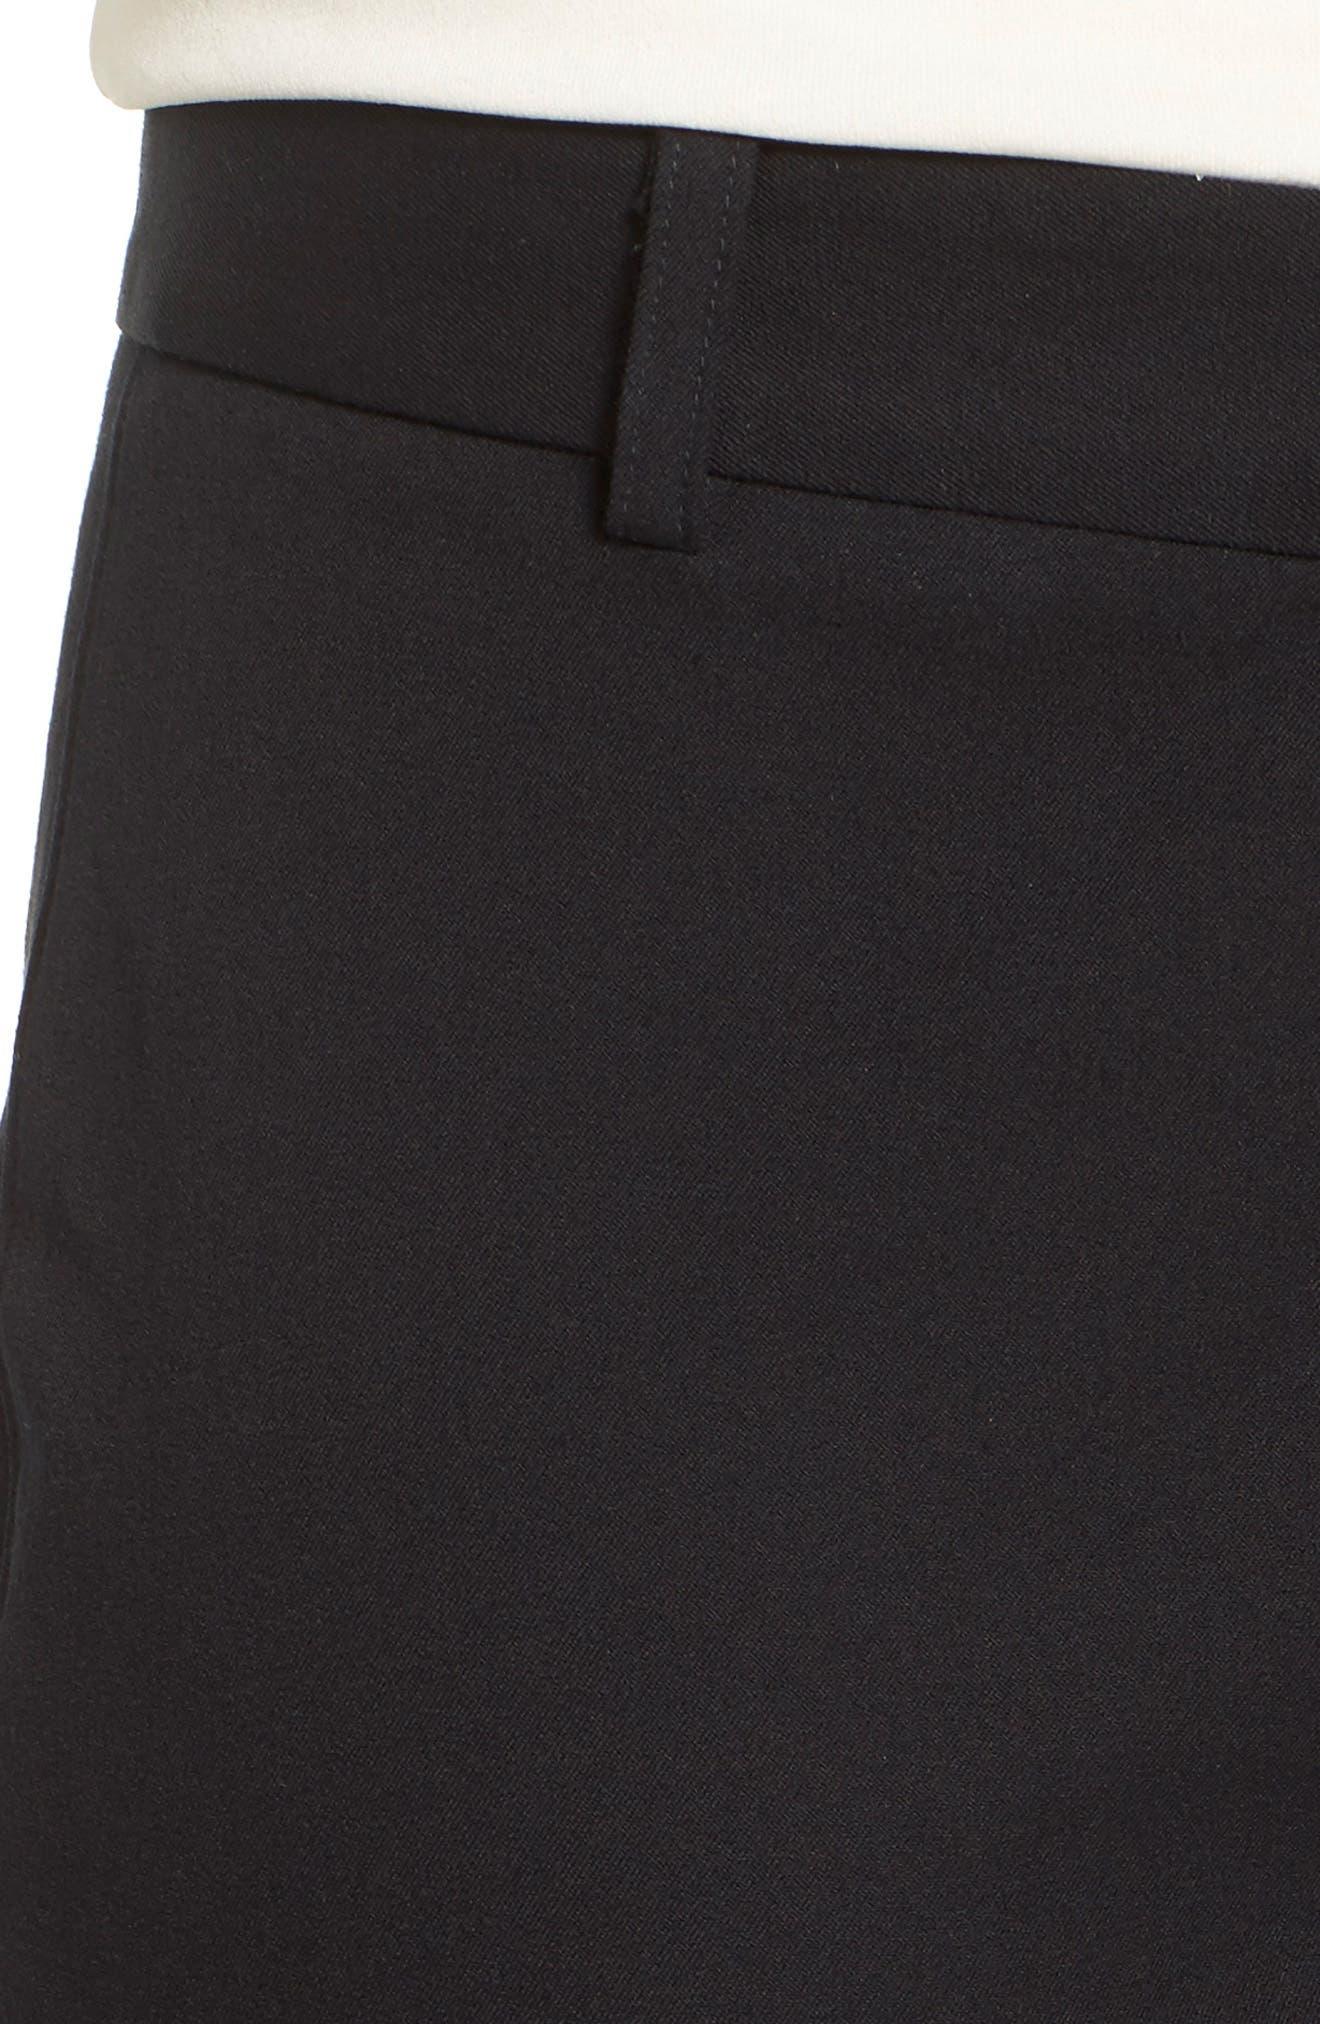 Straight Leg Pants,                             Alternate thumbnail 2, color,                             001